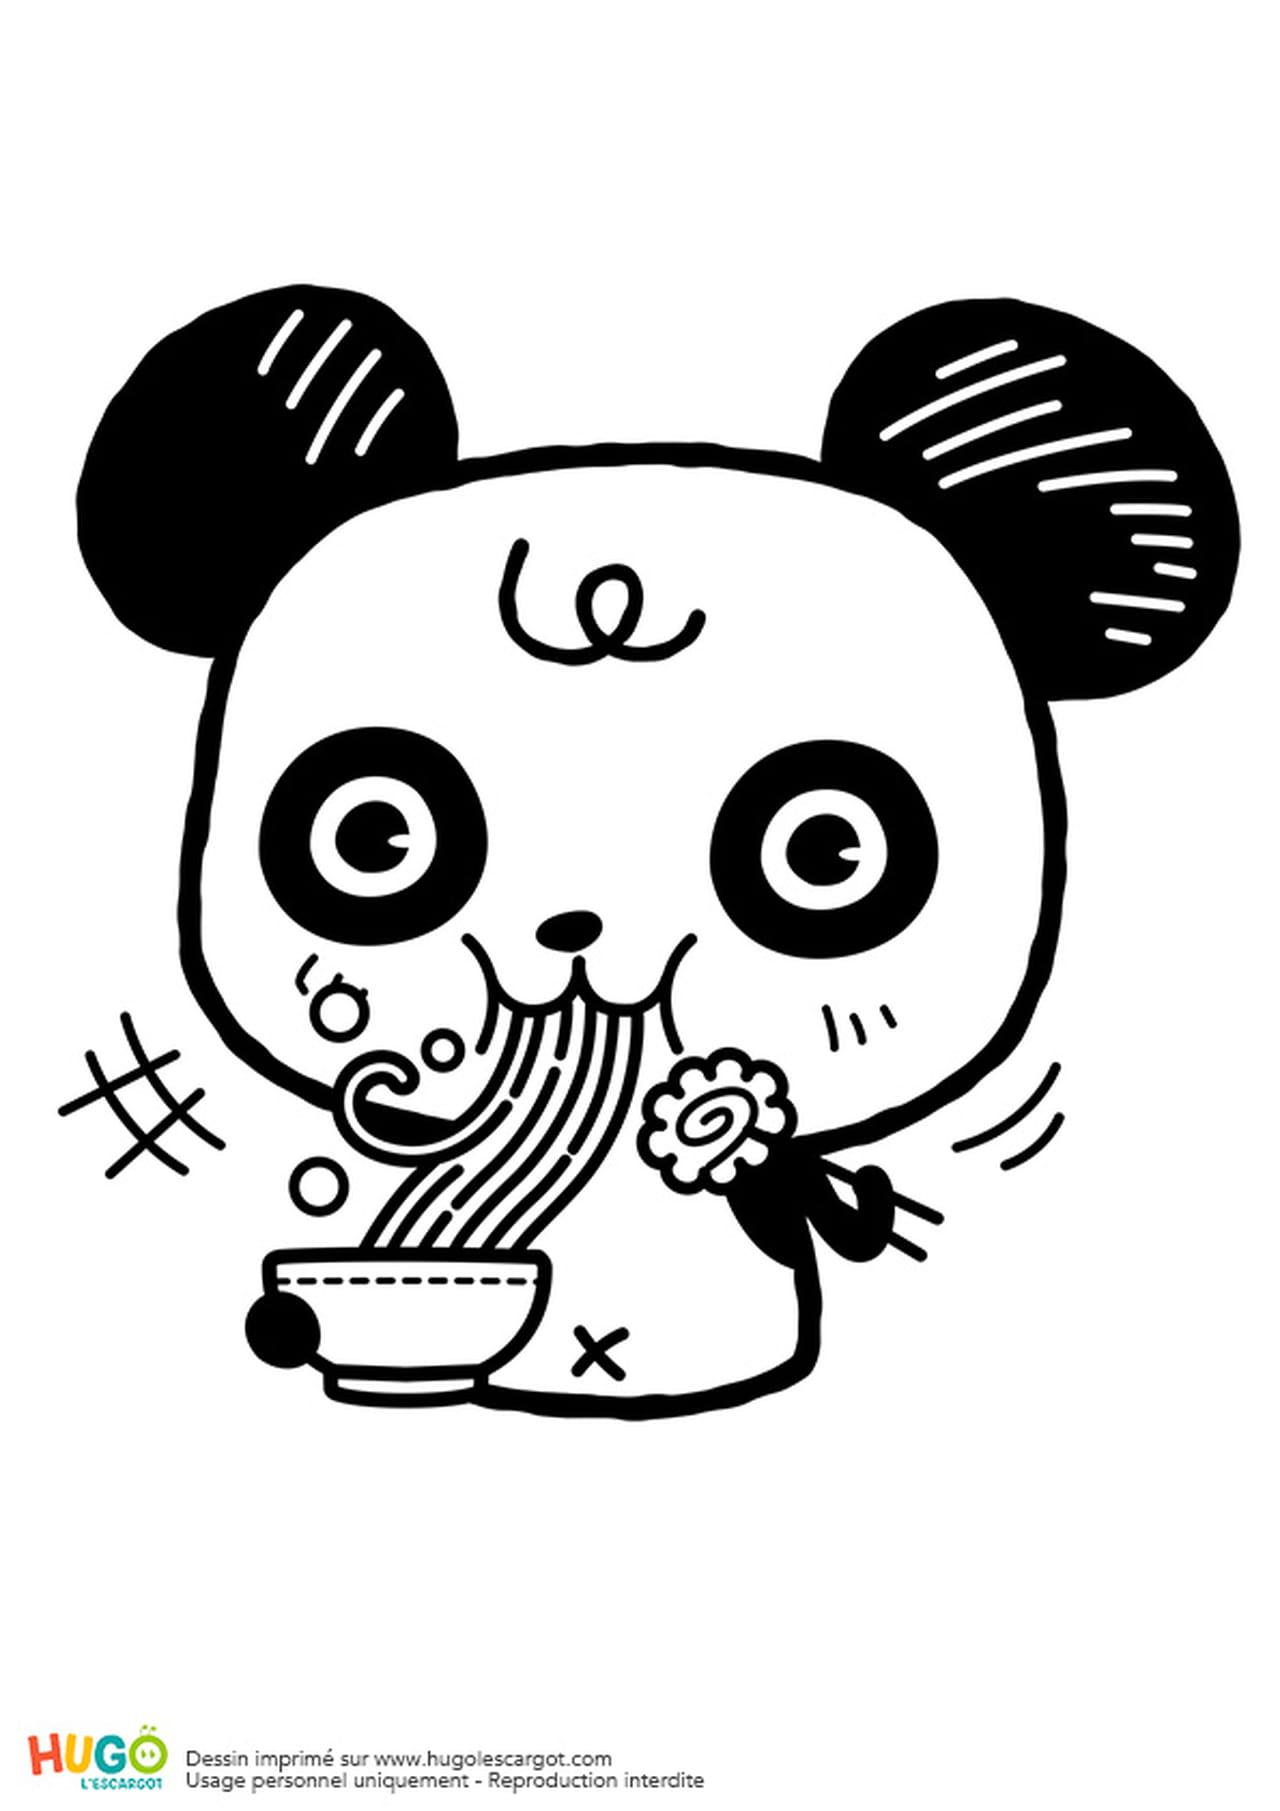 Coloriage Kawaii Panda.Coloriage Panda Et Bol De Ramen Kawaii En Ligne Gratuit A